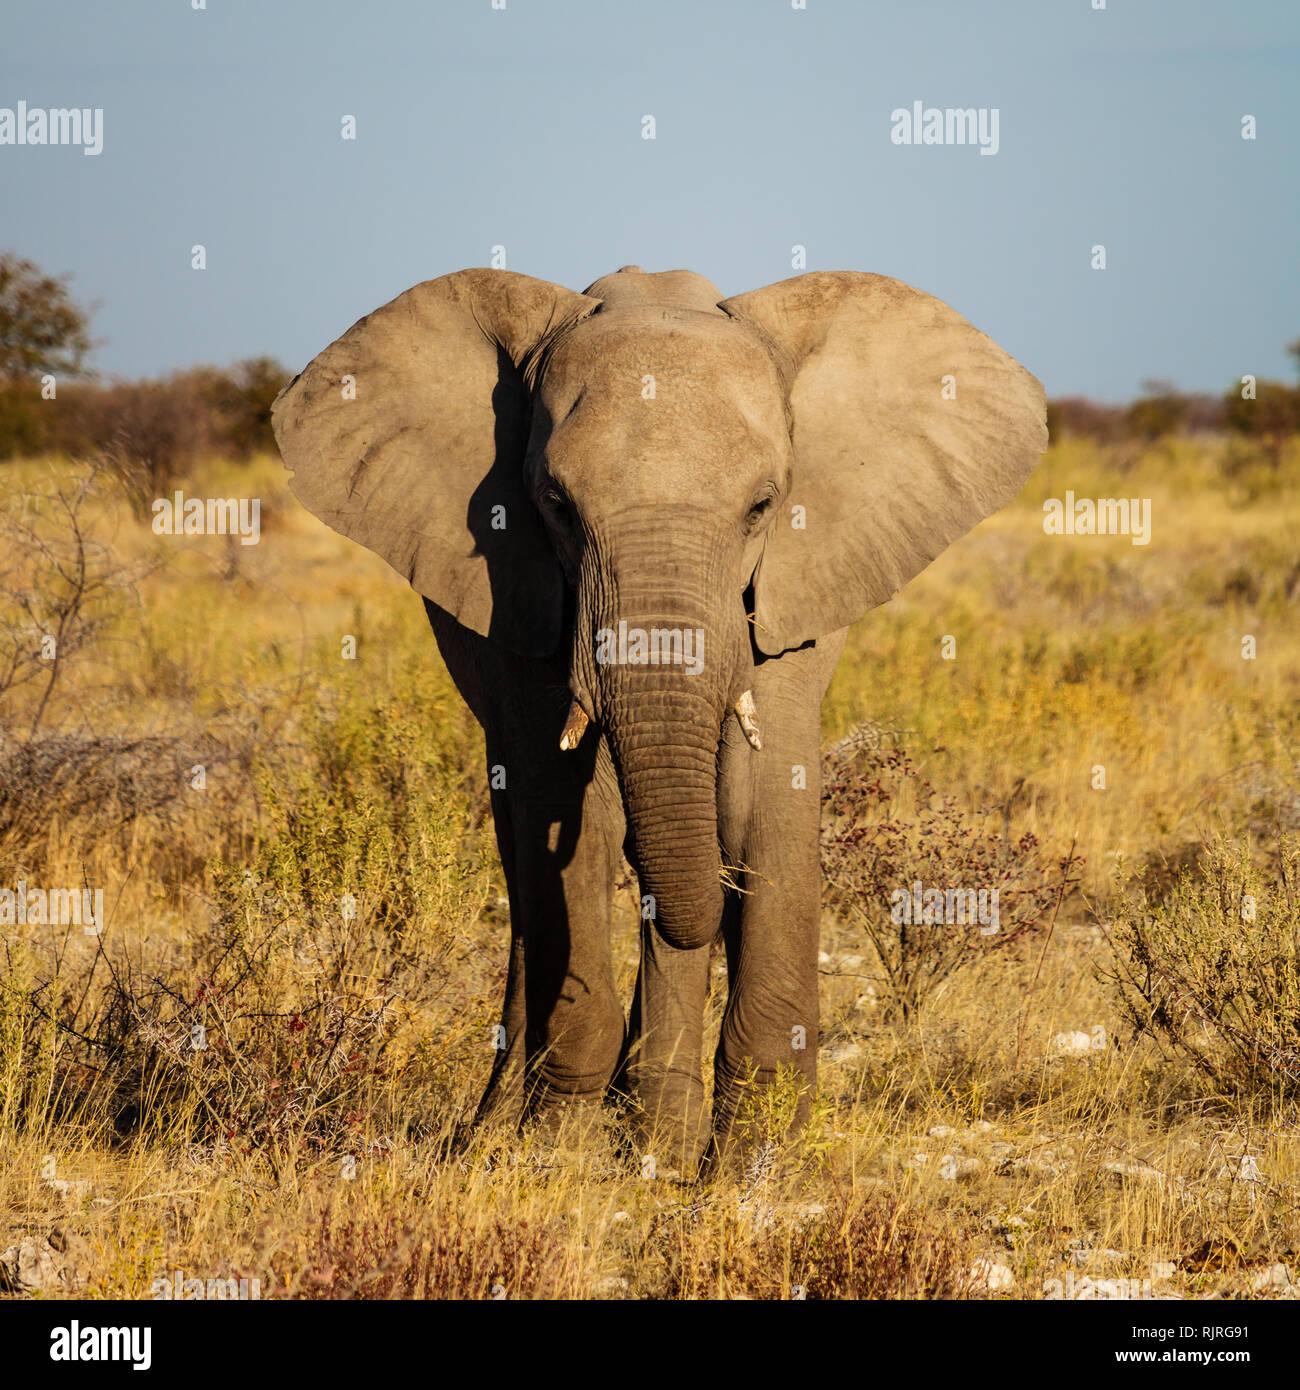 Elephant walking in the Etosha natural park in Namibia, Africa - Stock Image